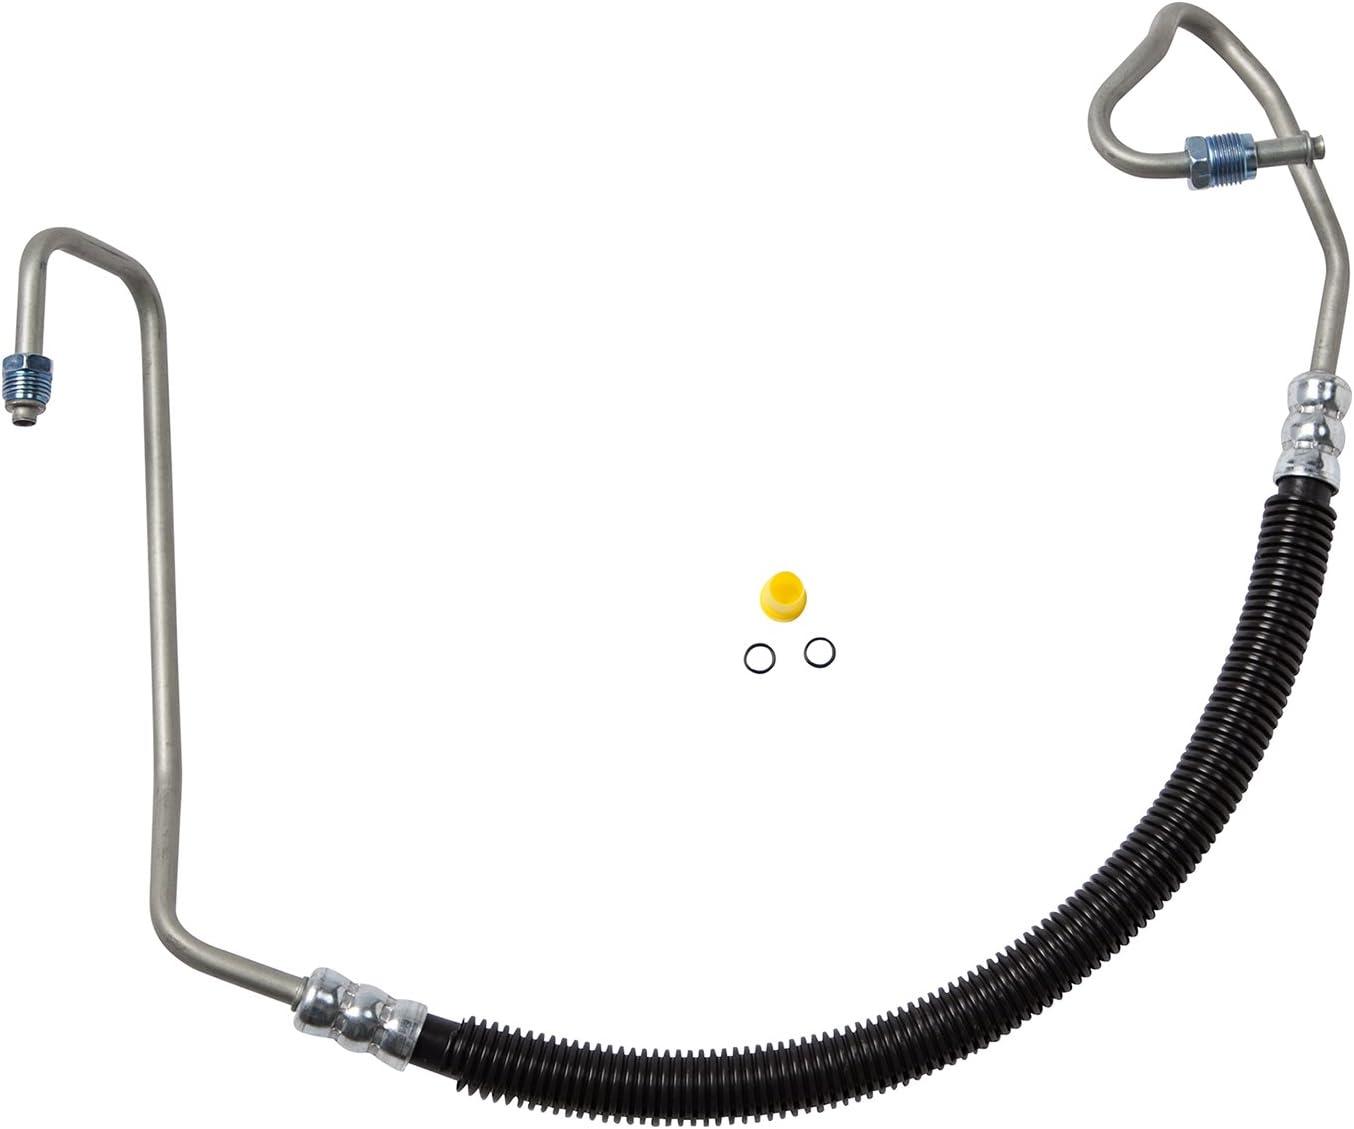 Edelmann 92084 Power Steering Pressure Hose